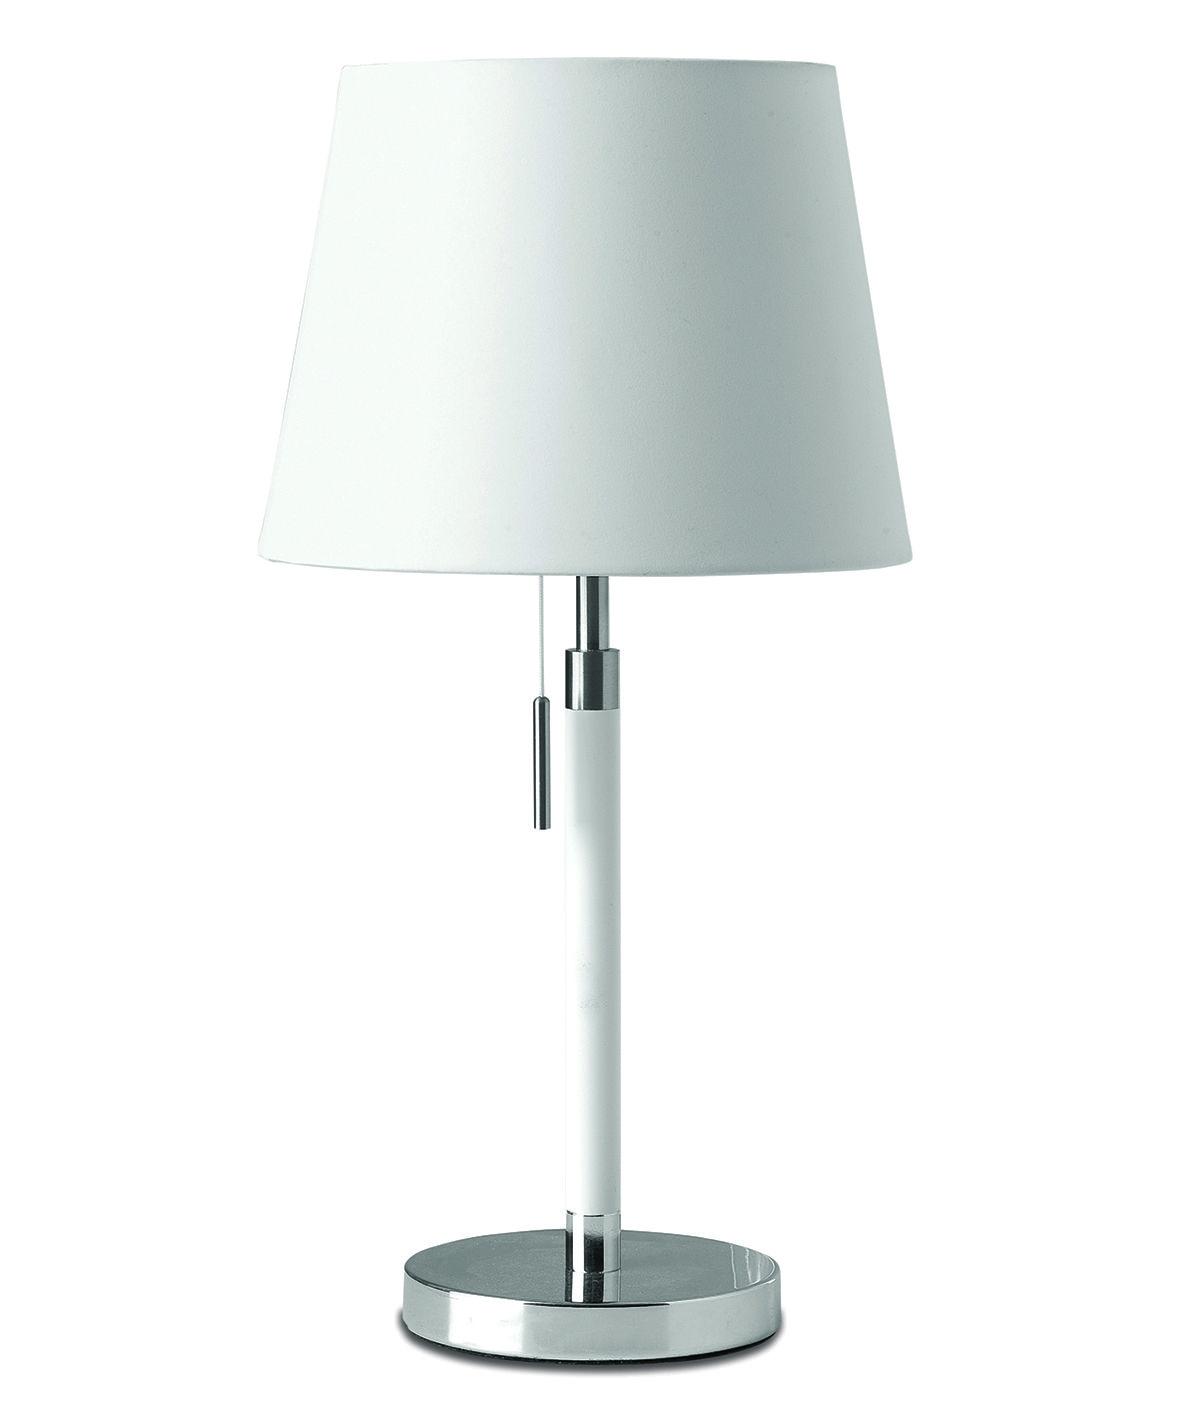 Frandsen Venice tafellamp wit chroom